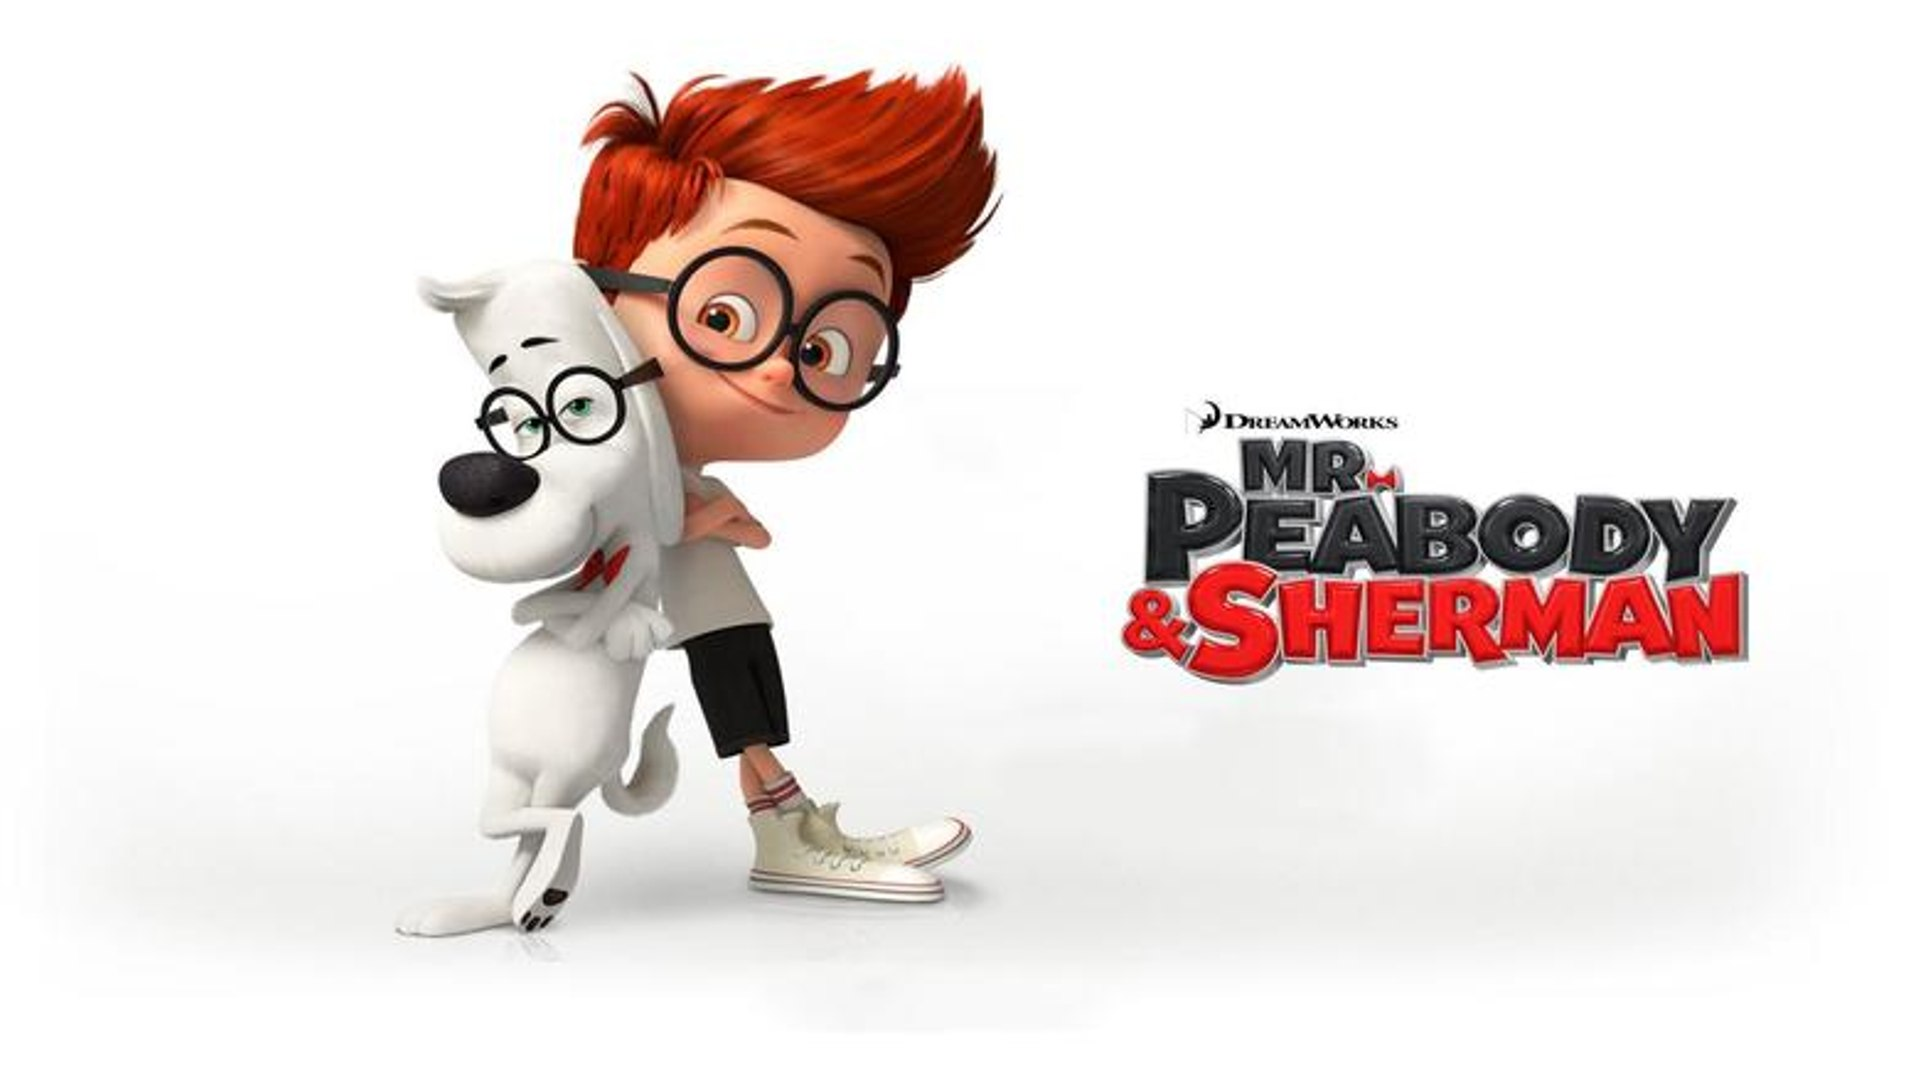 mr peabody  sherman full movie free download